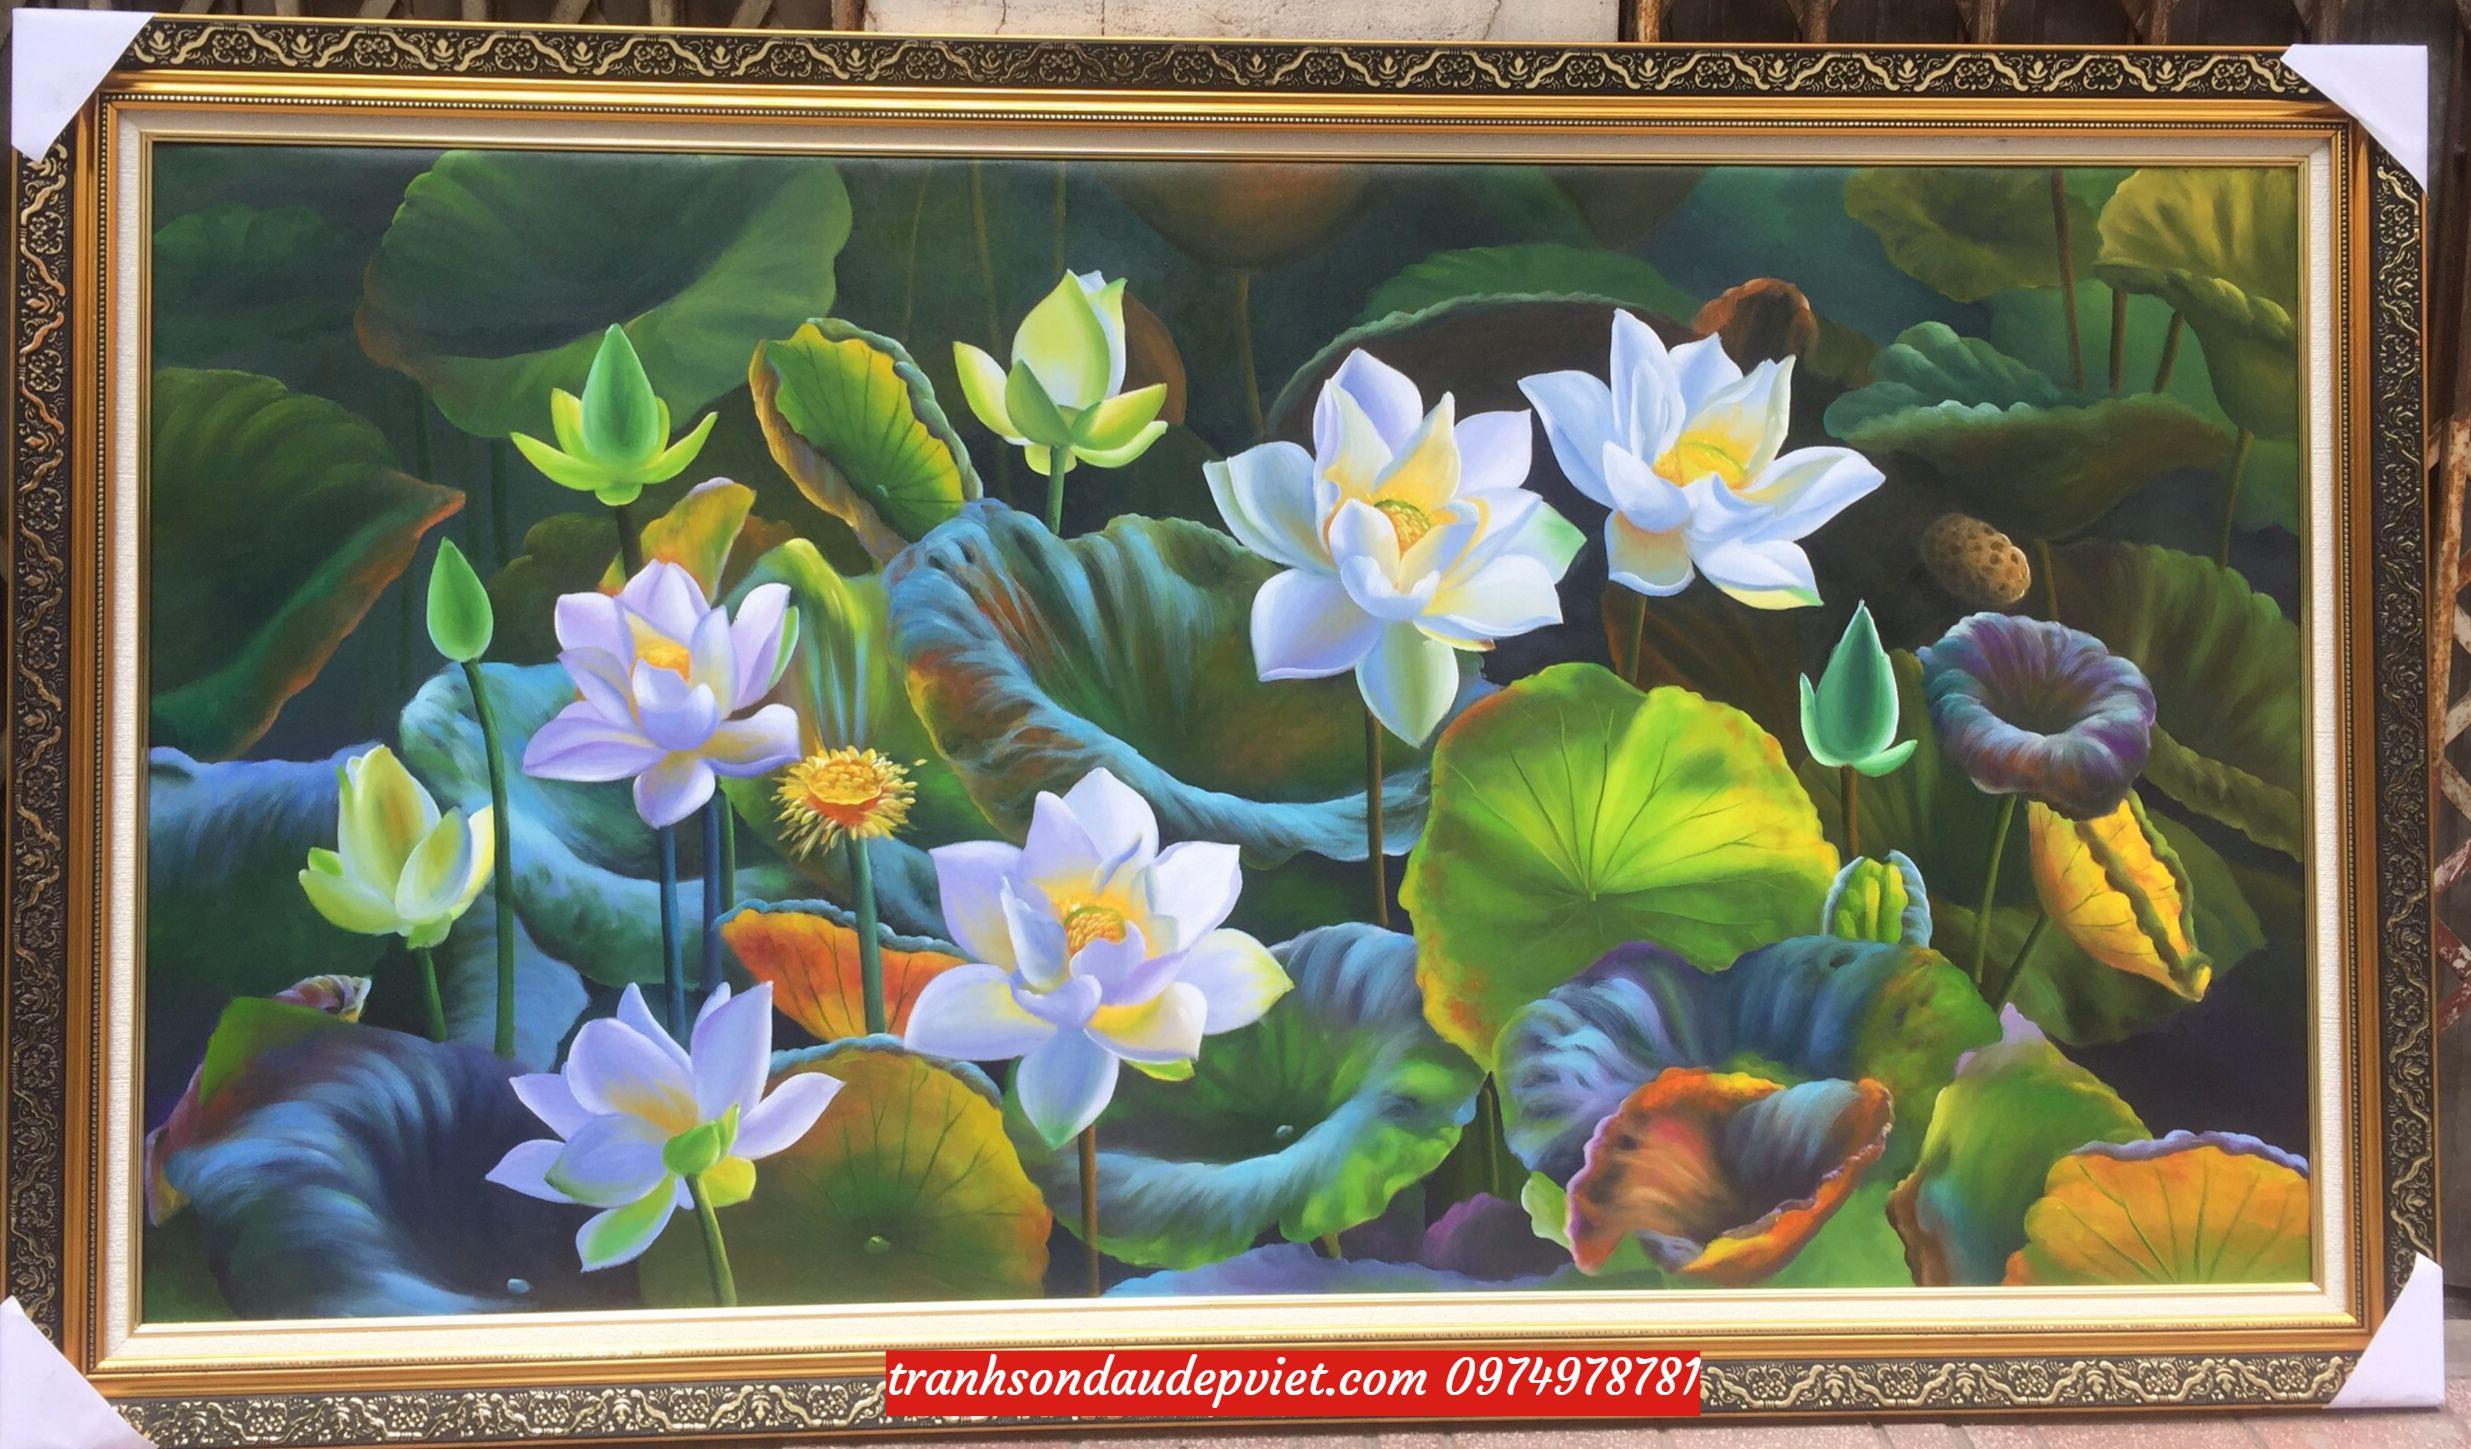 Tranh sen hoa sen ý nghĩa, tranh sơn dầu SB122